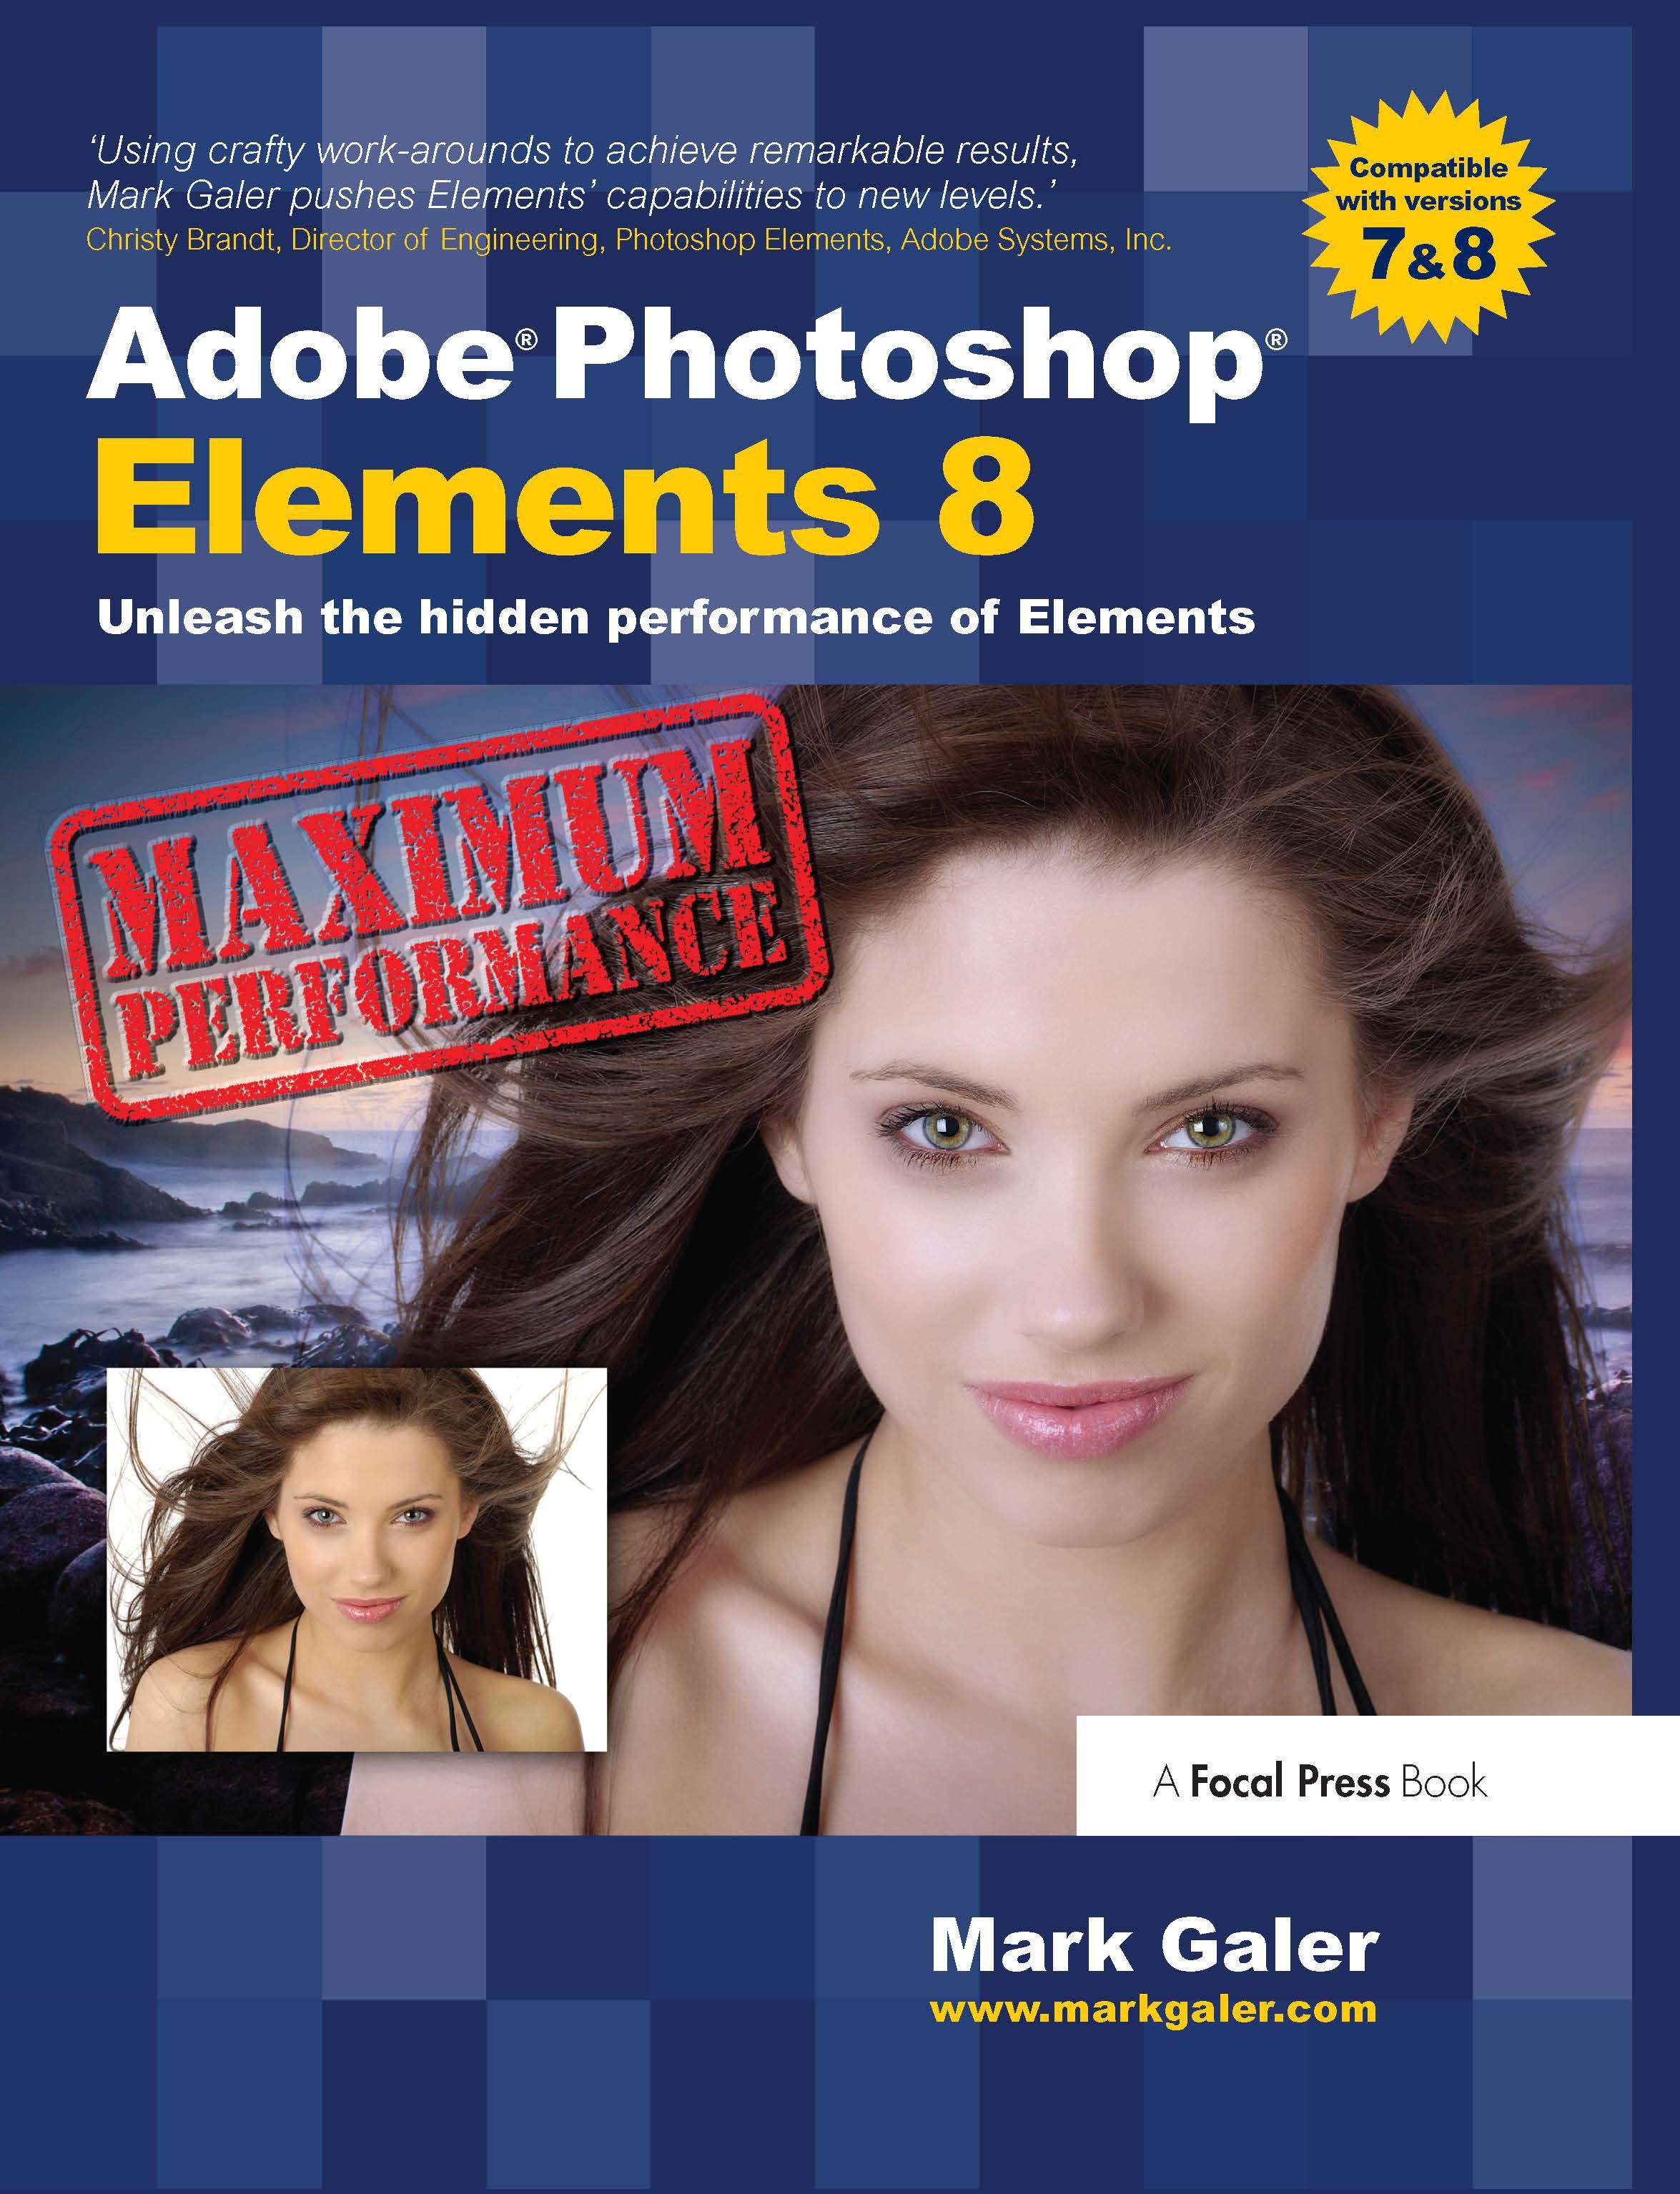 Adobe Photoshop Elements 8: Maximum Performance: Unleash the hidden performance of Elements book cover